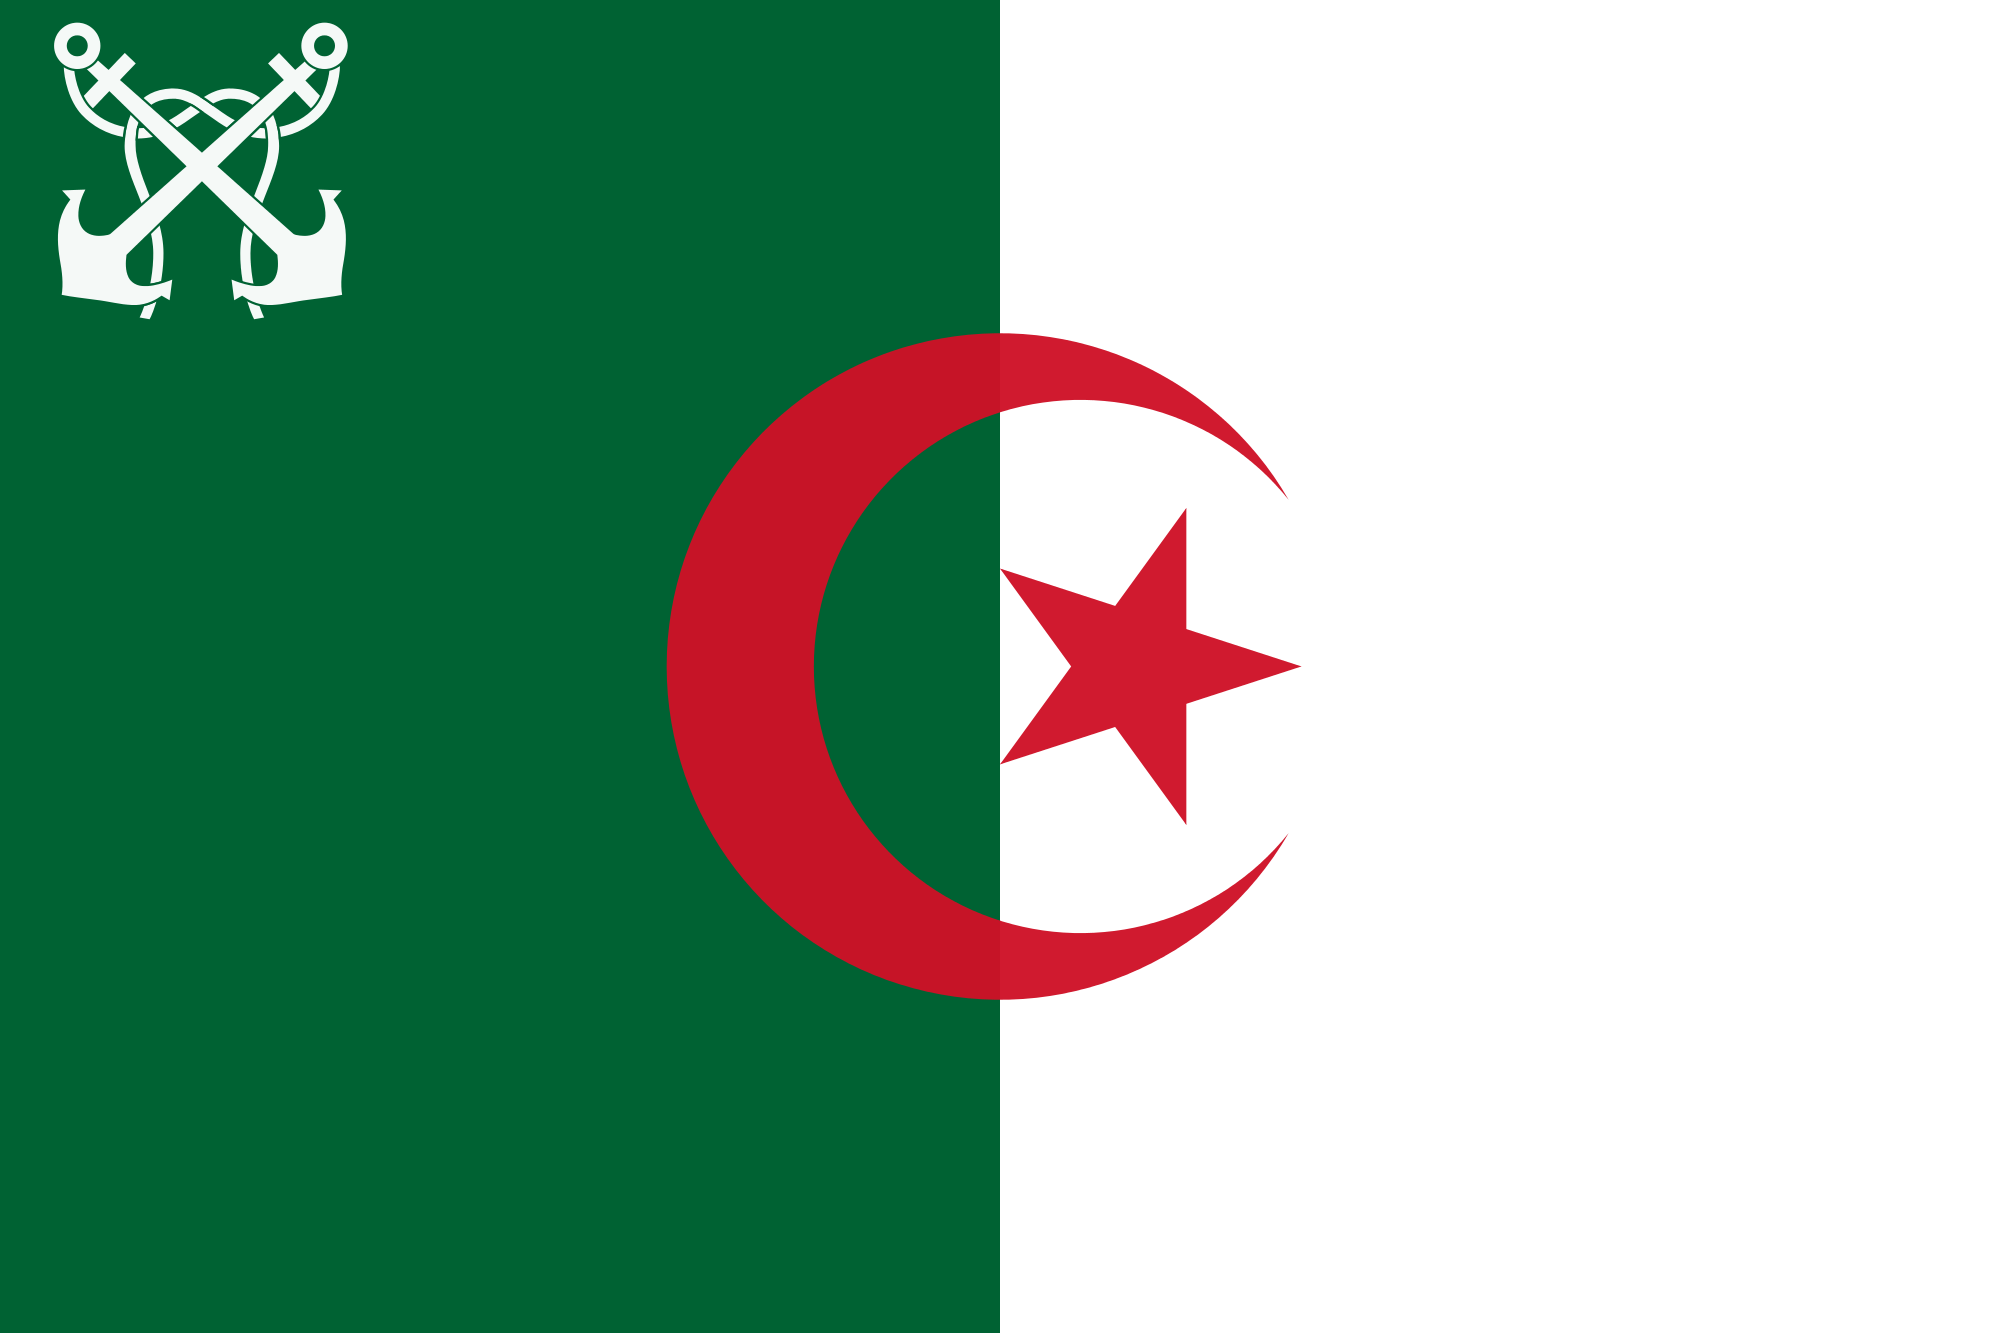 Algeria (Naval ensign)